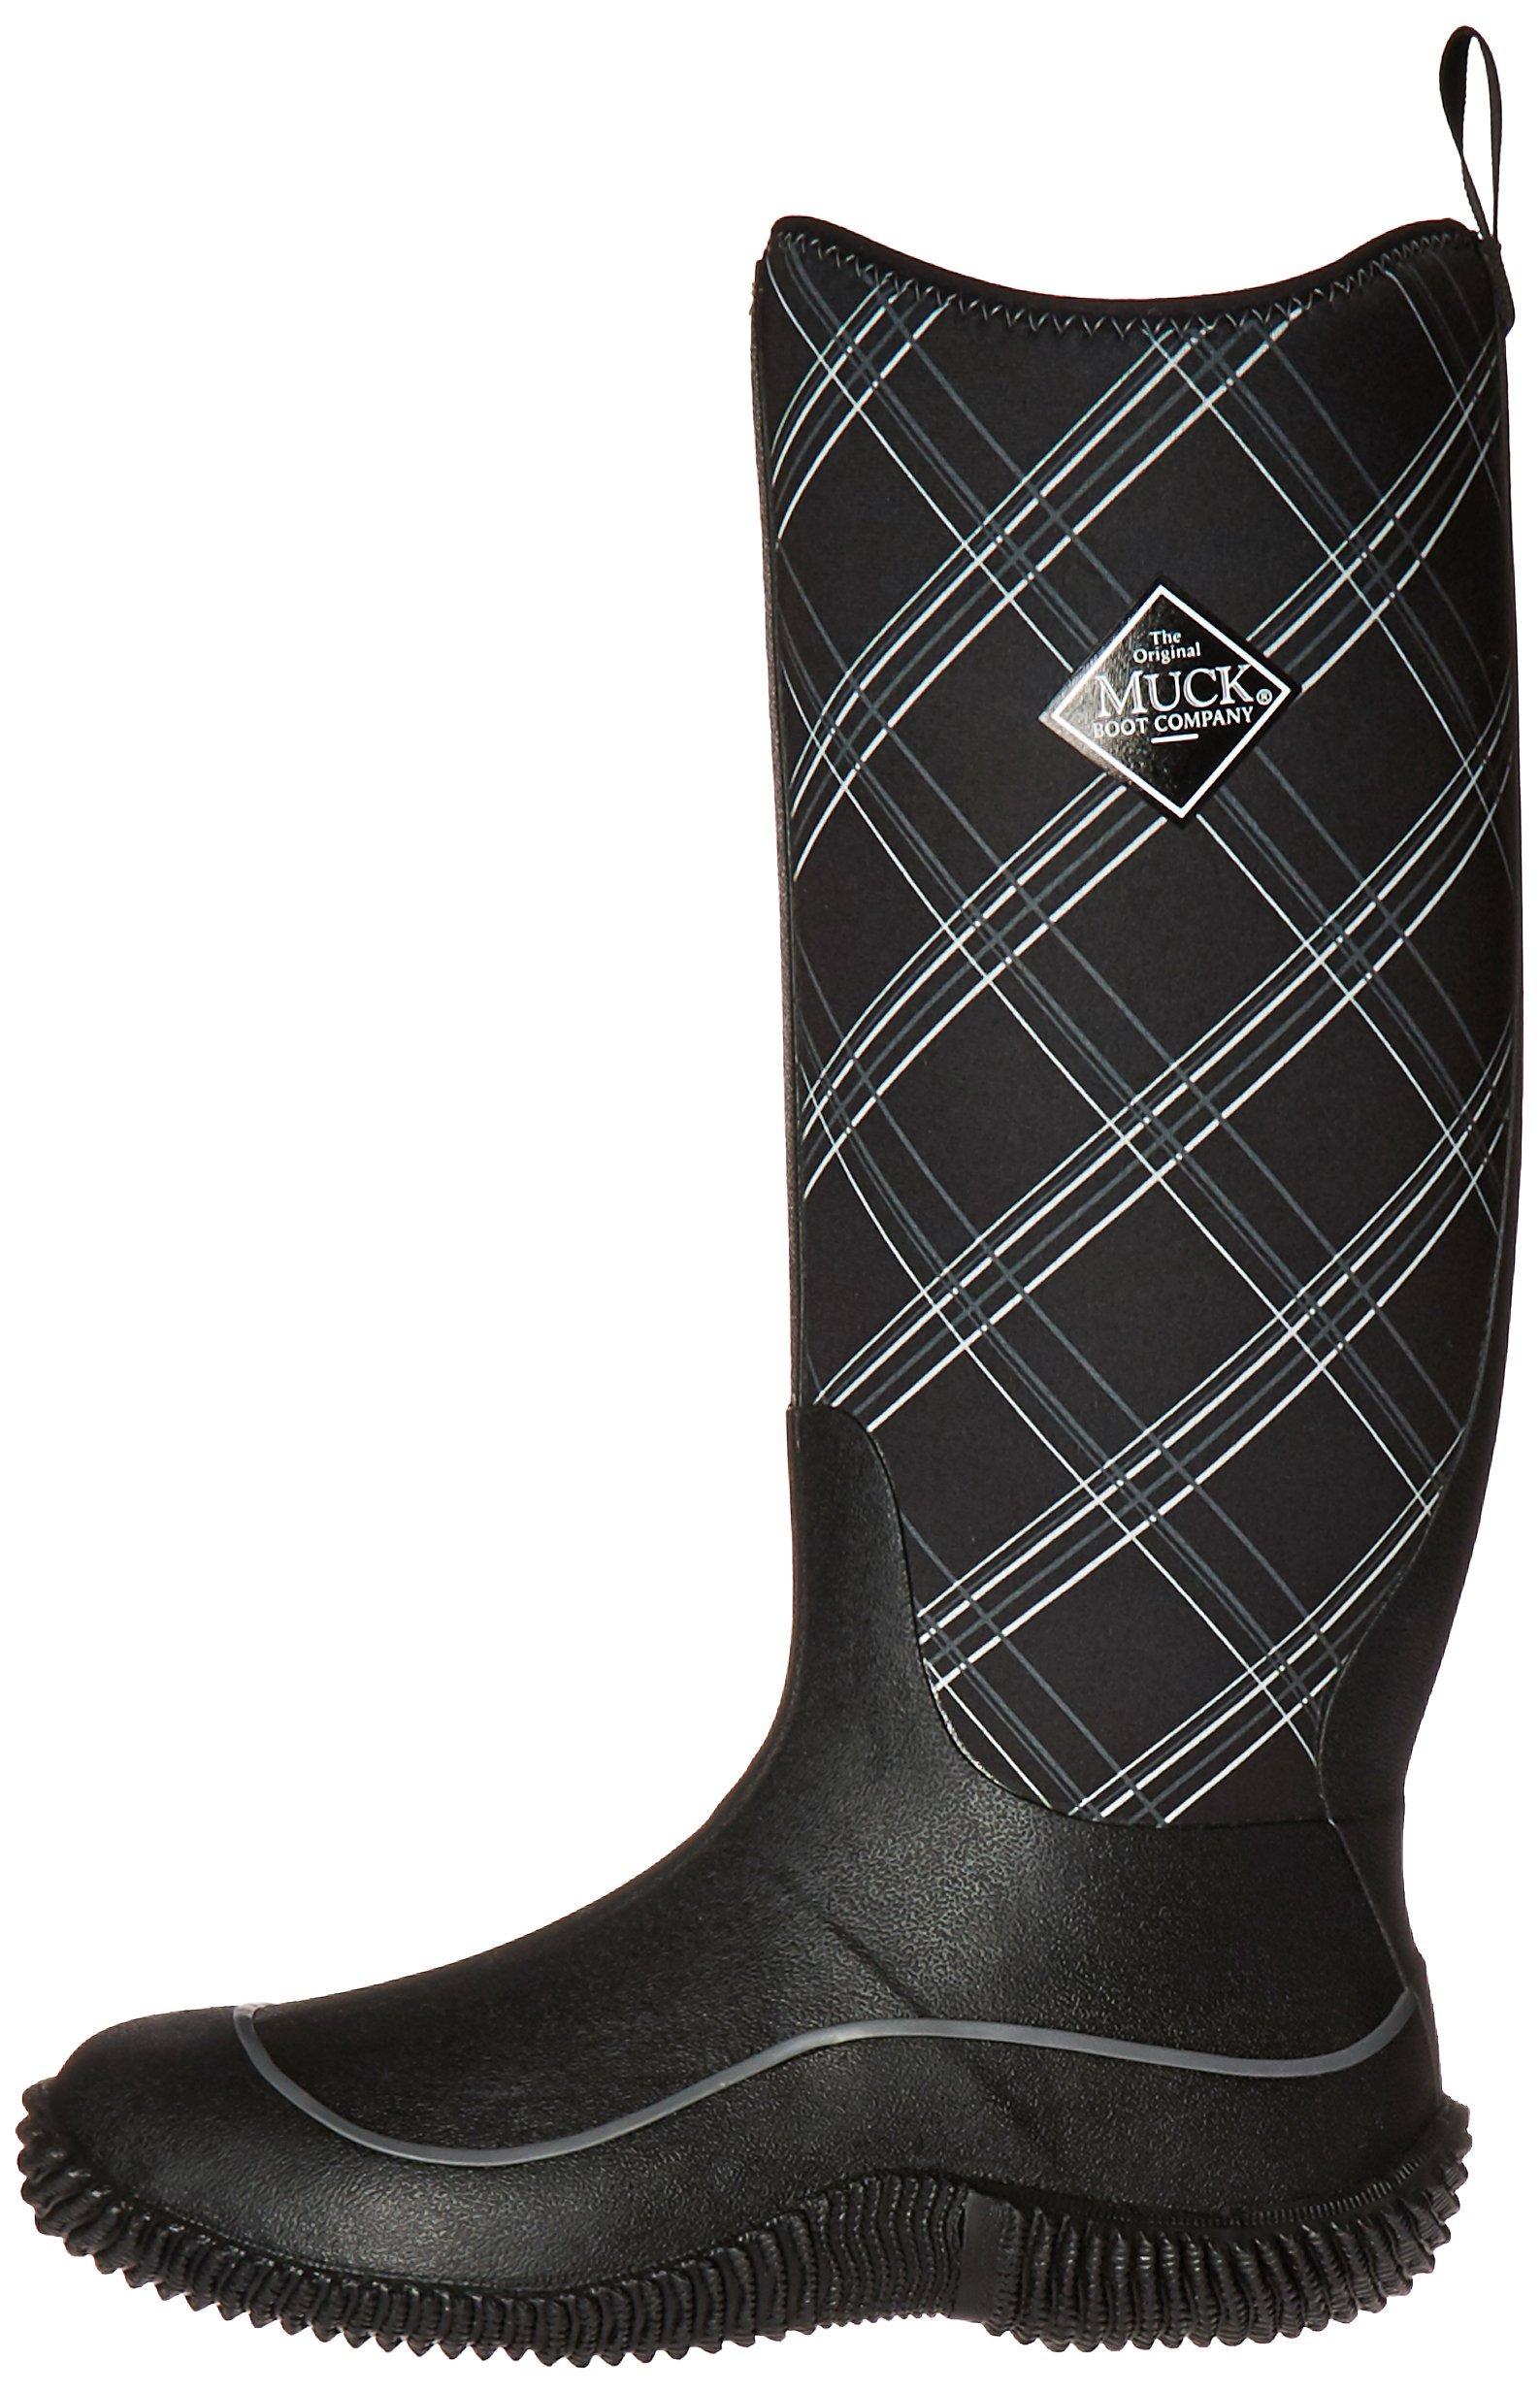 Muck Hale Multi-Season Women's Rubber Boots by Muck Boot (Image #5)